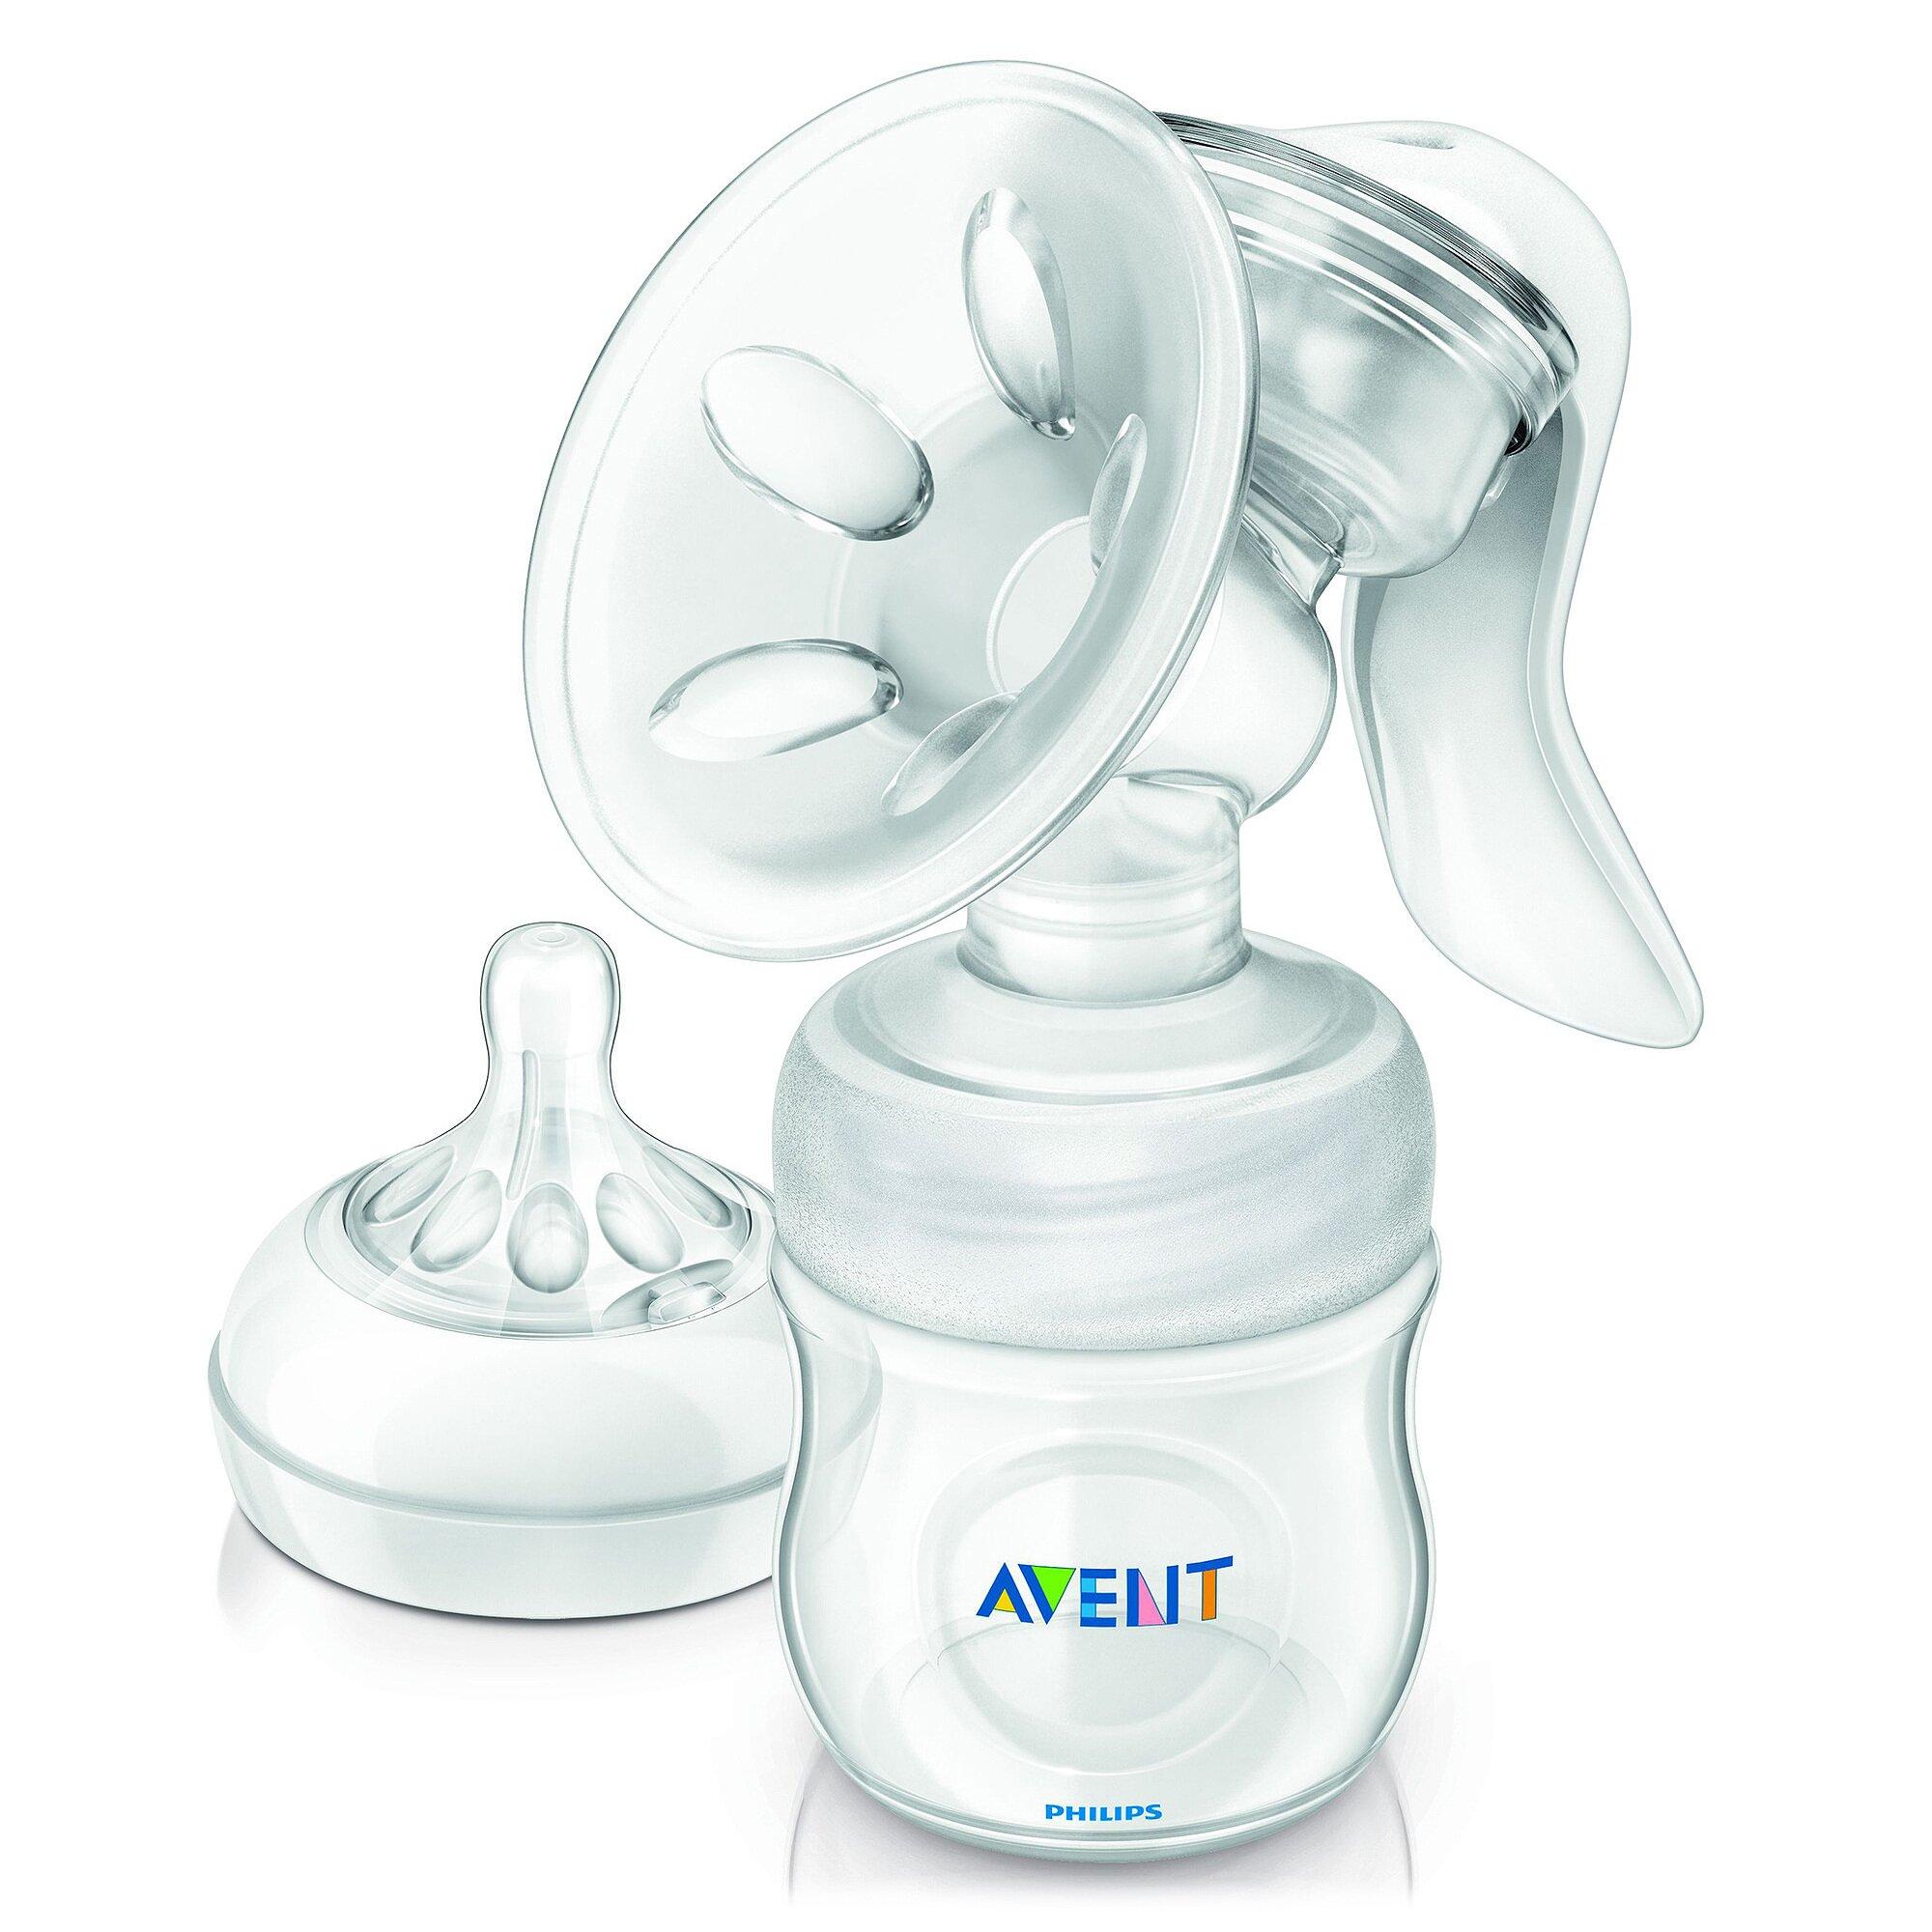 philips-avent-komfort-handmilchpumpe